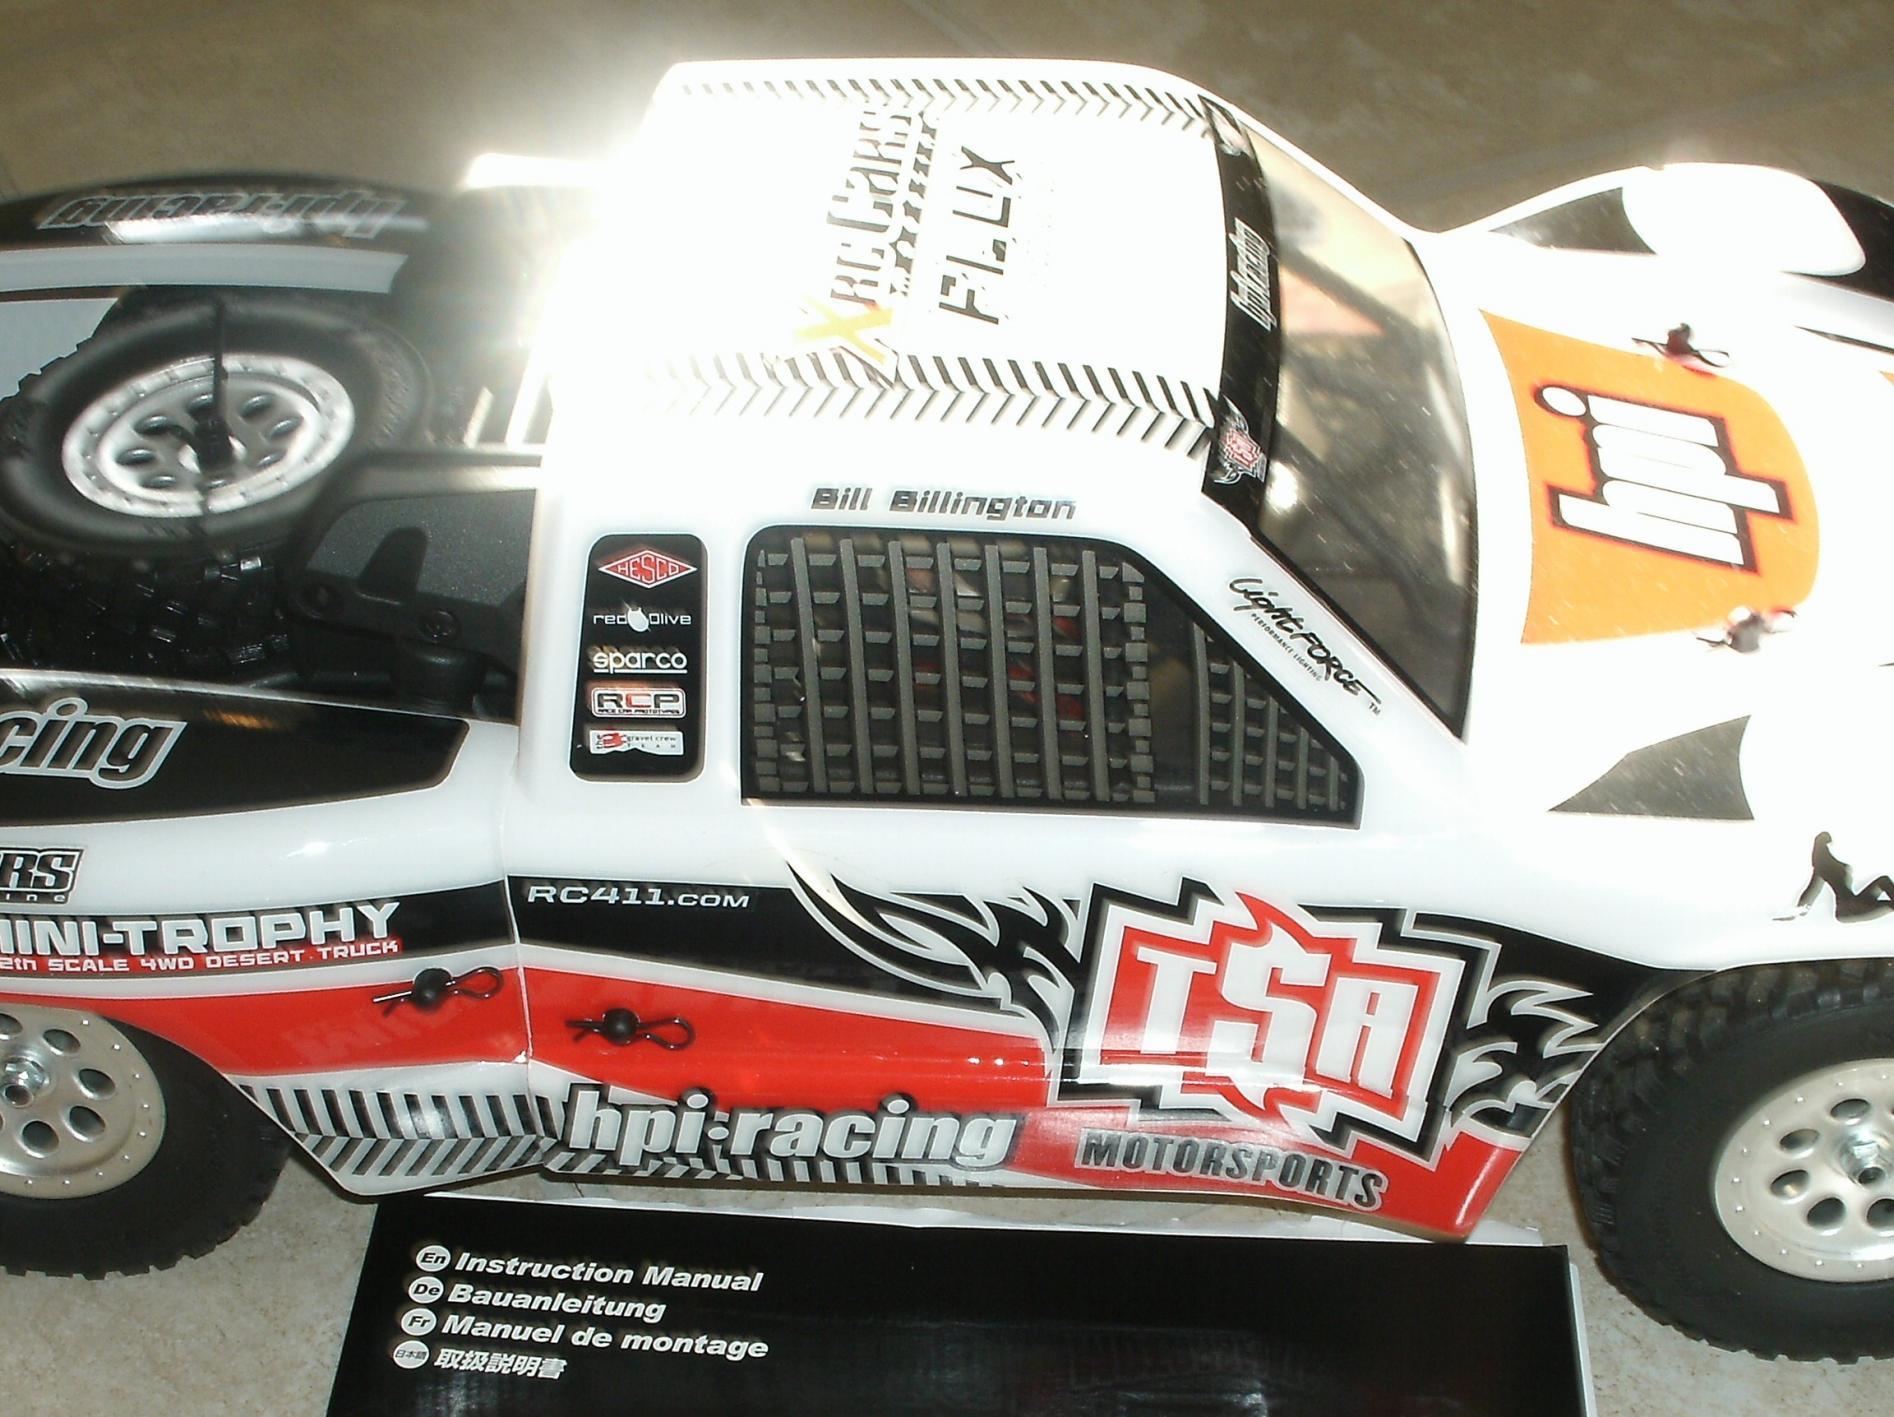 Trophy Truck For Sale Craigslist >> Brushless trophy truck hpi - R/C Tech Forums